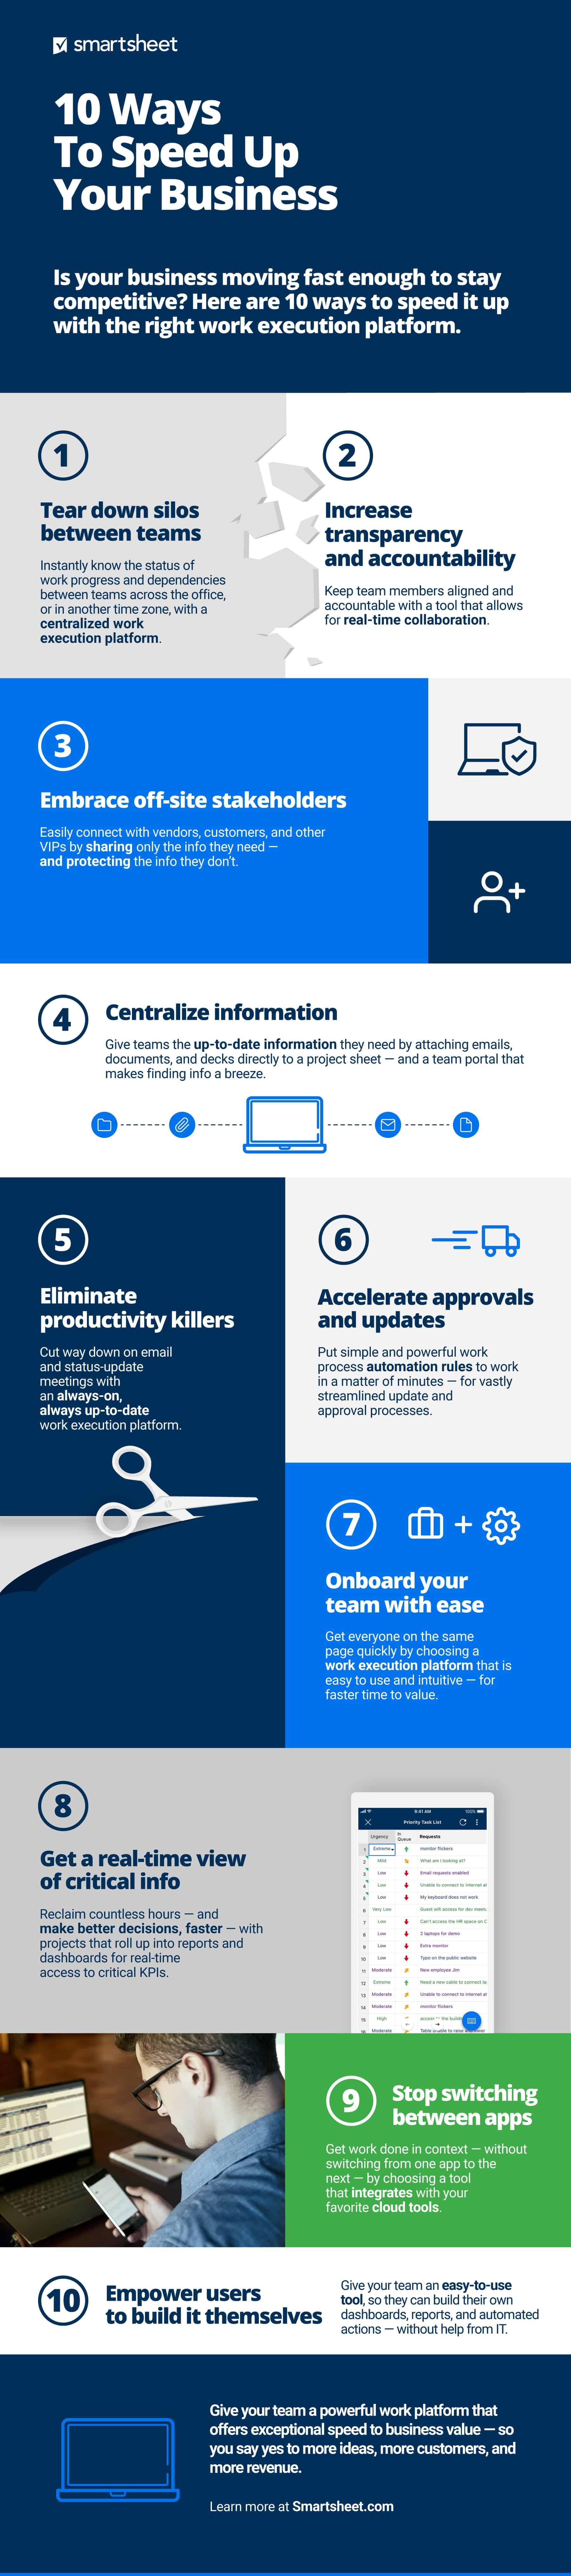 Ten Ways to Speed Business